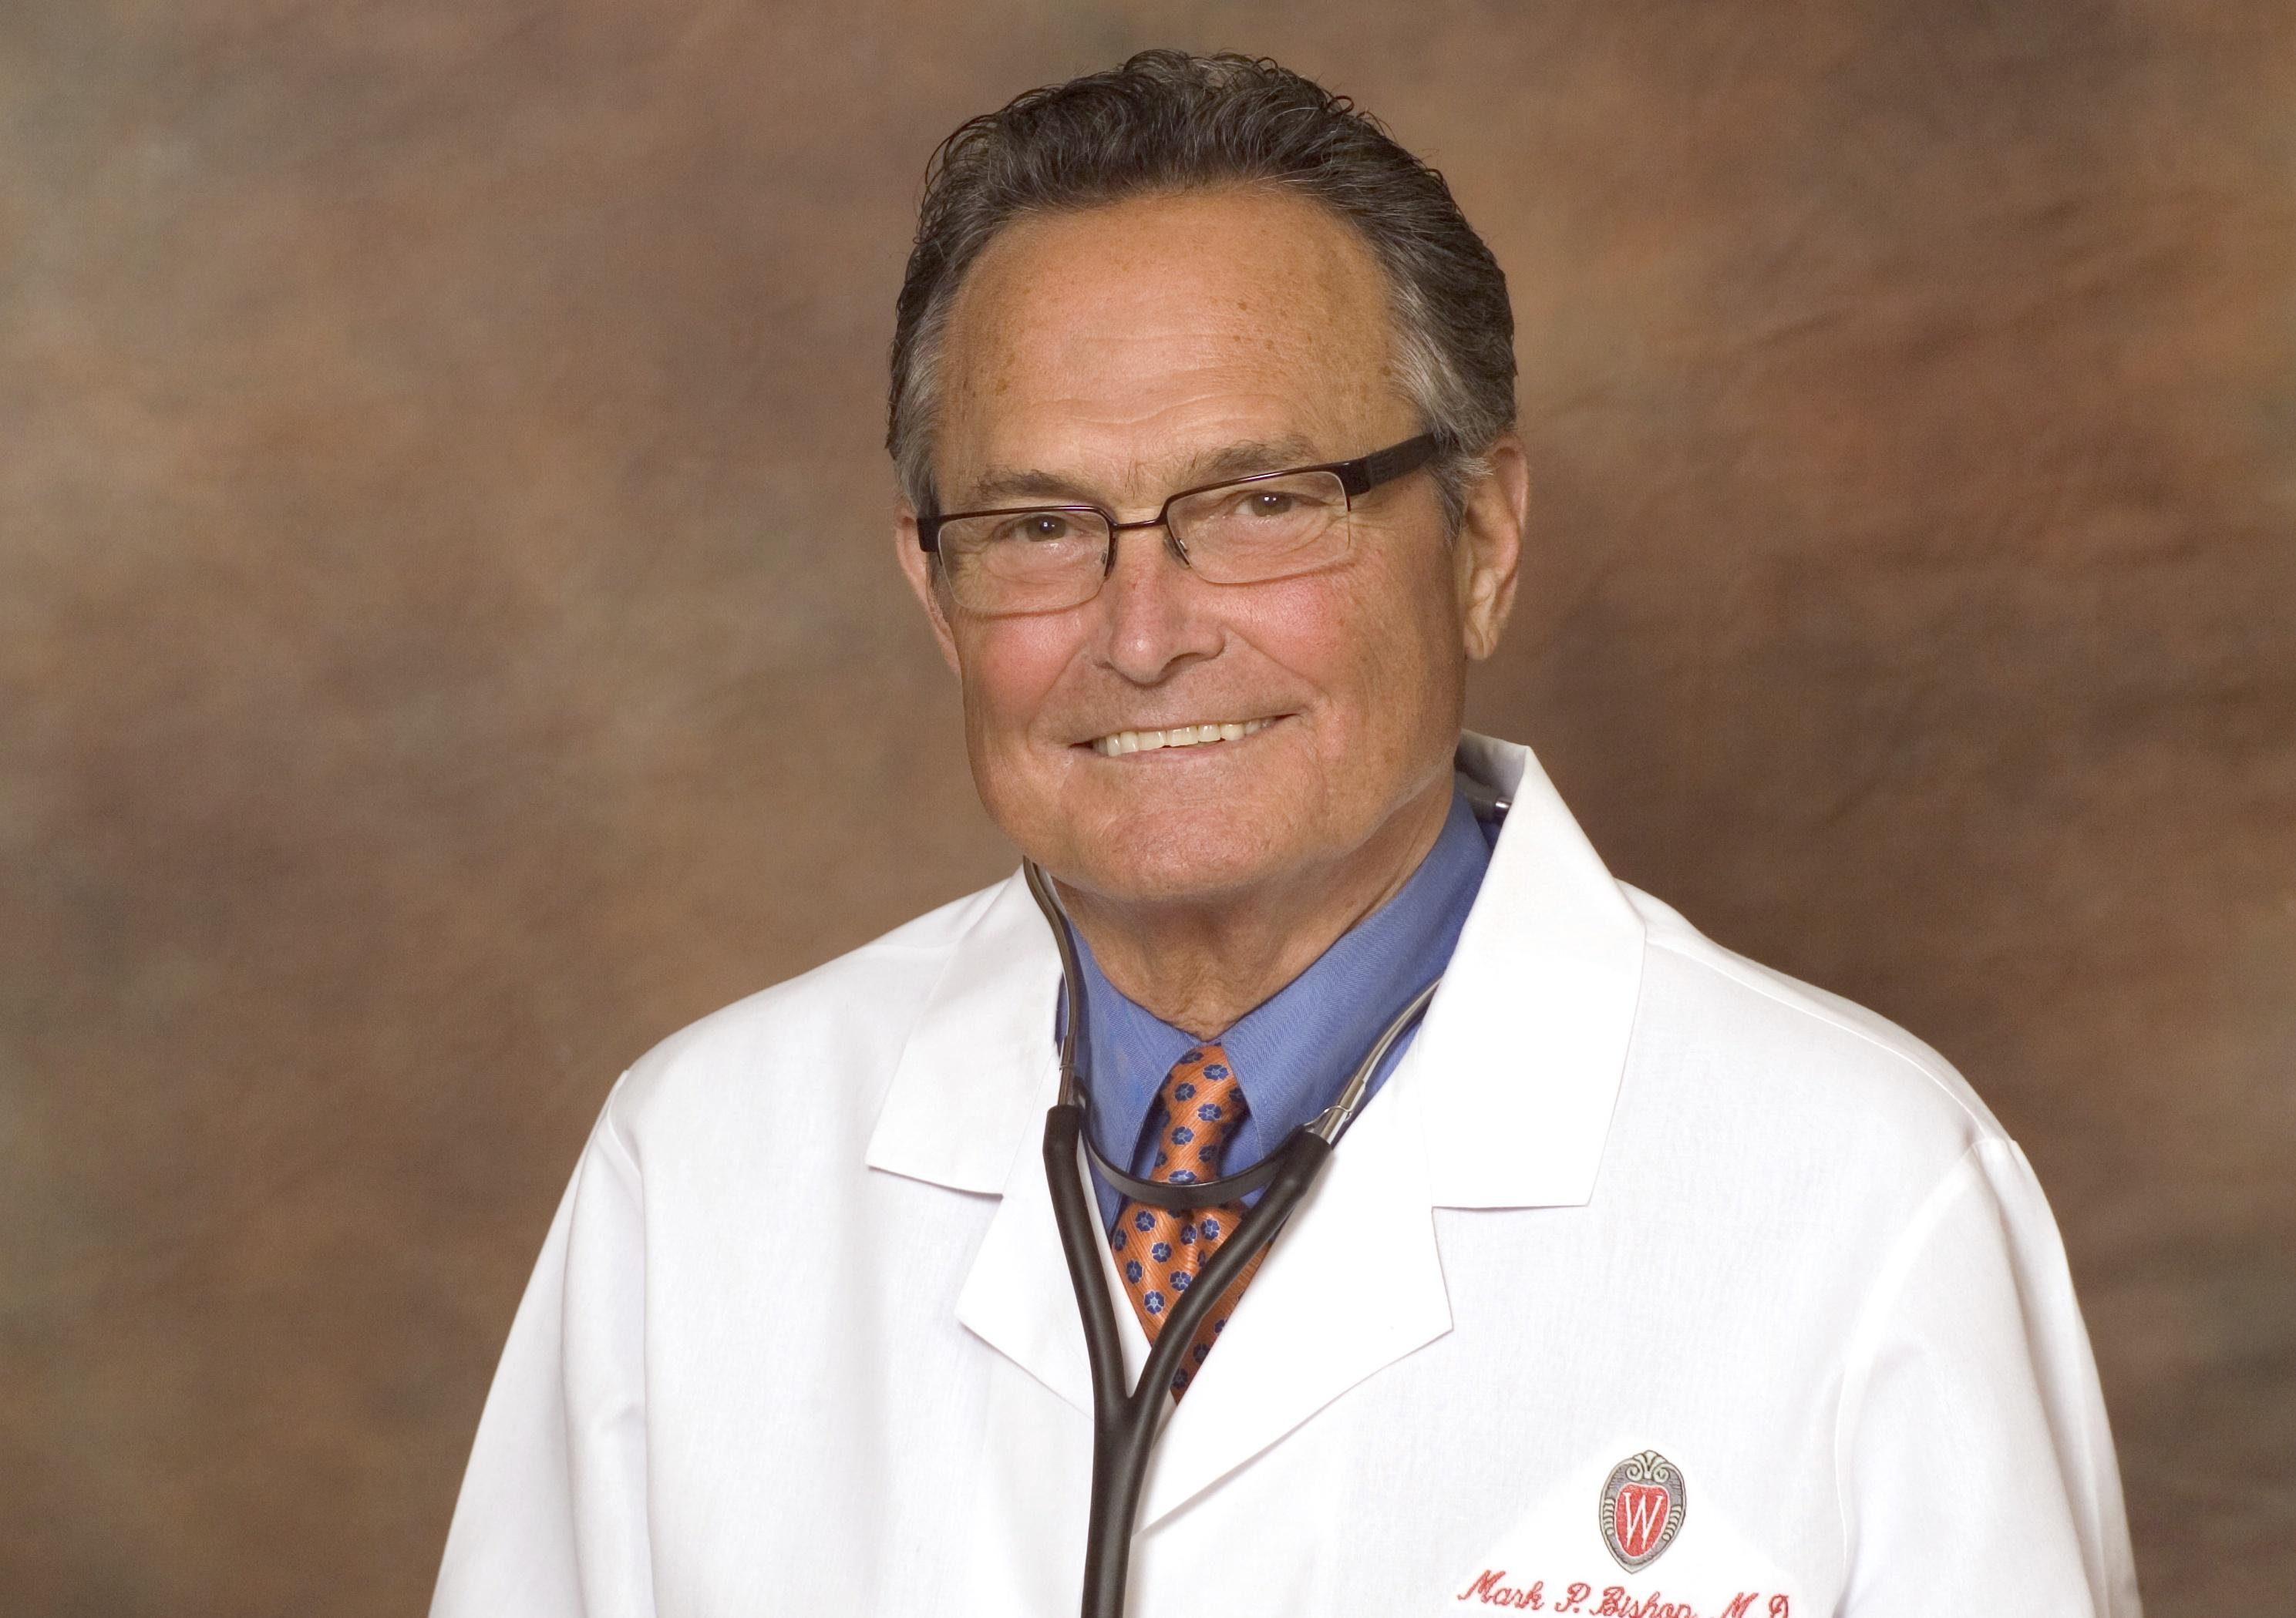 Mark Paul Bishop, M.D.